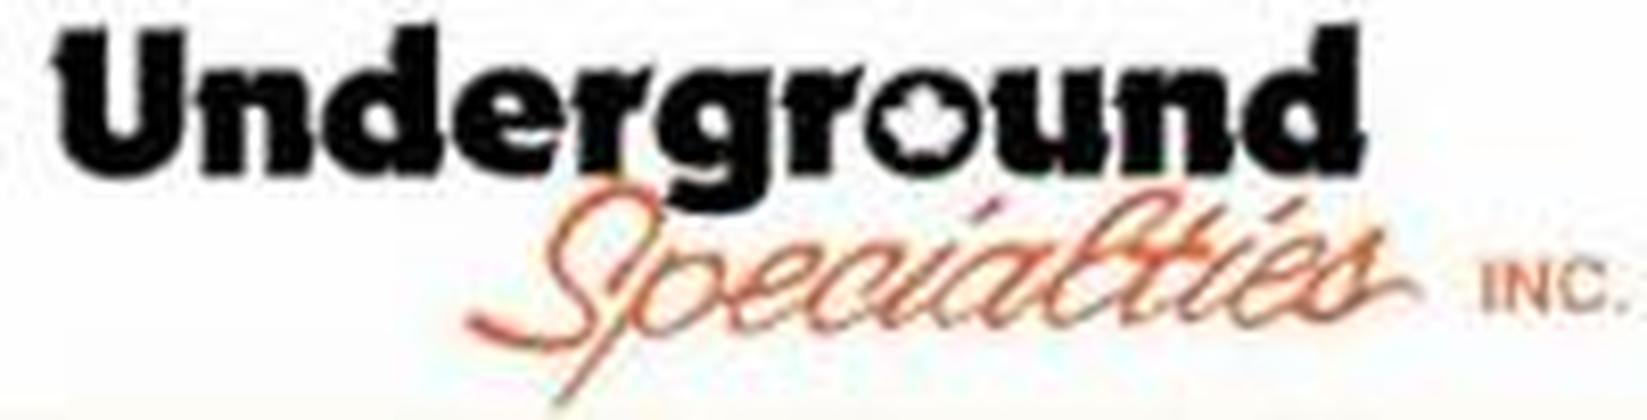 Underground Specialties Inc Logo